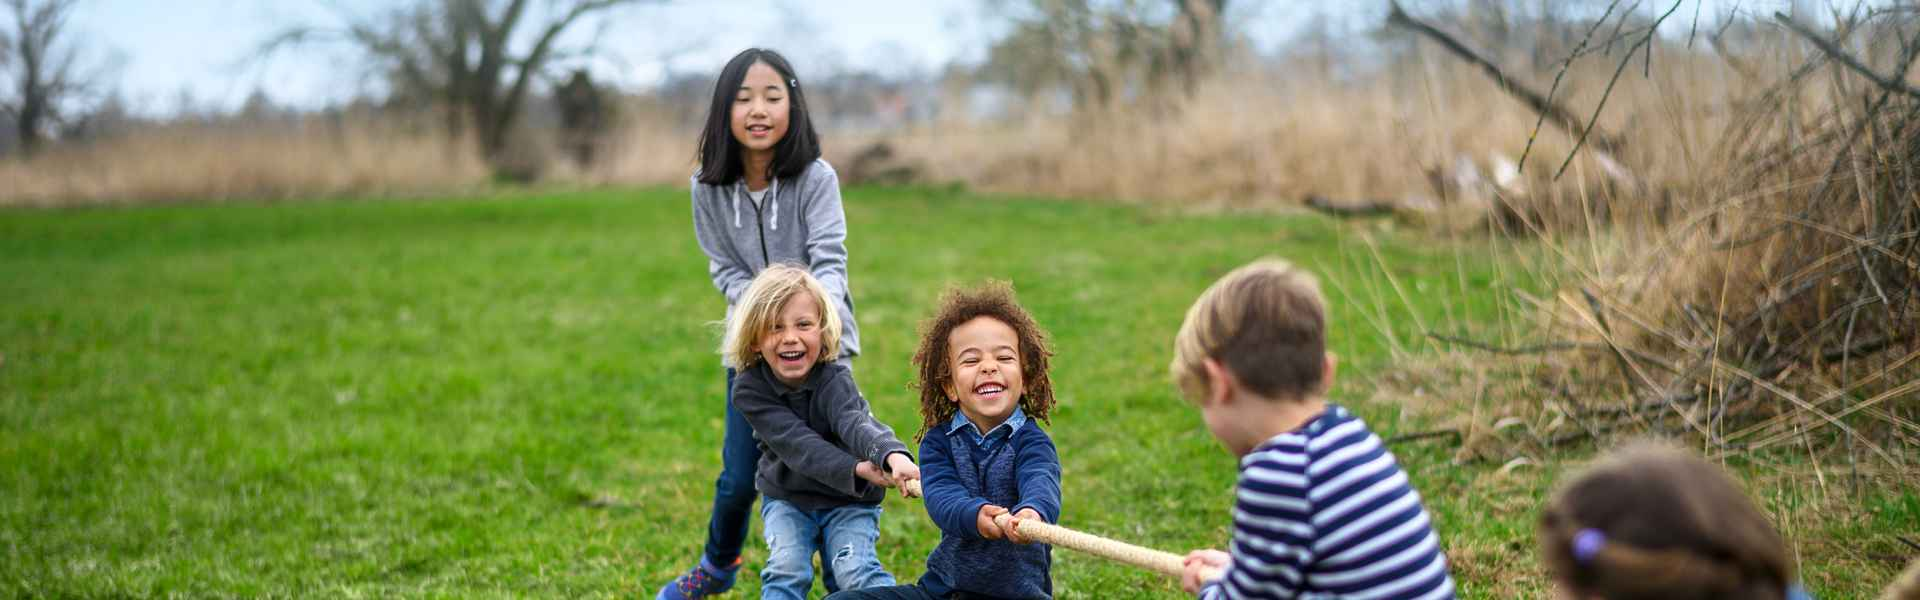 Imagefoto met de LEDRO GTX MID JUNIOR, LOWA Kids Kampagne 2019